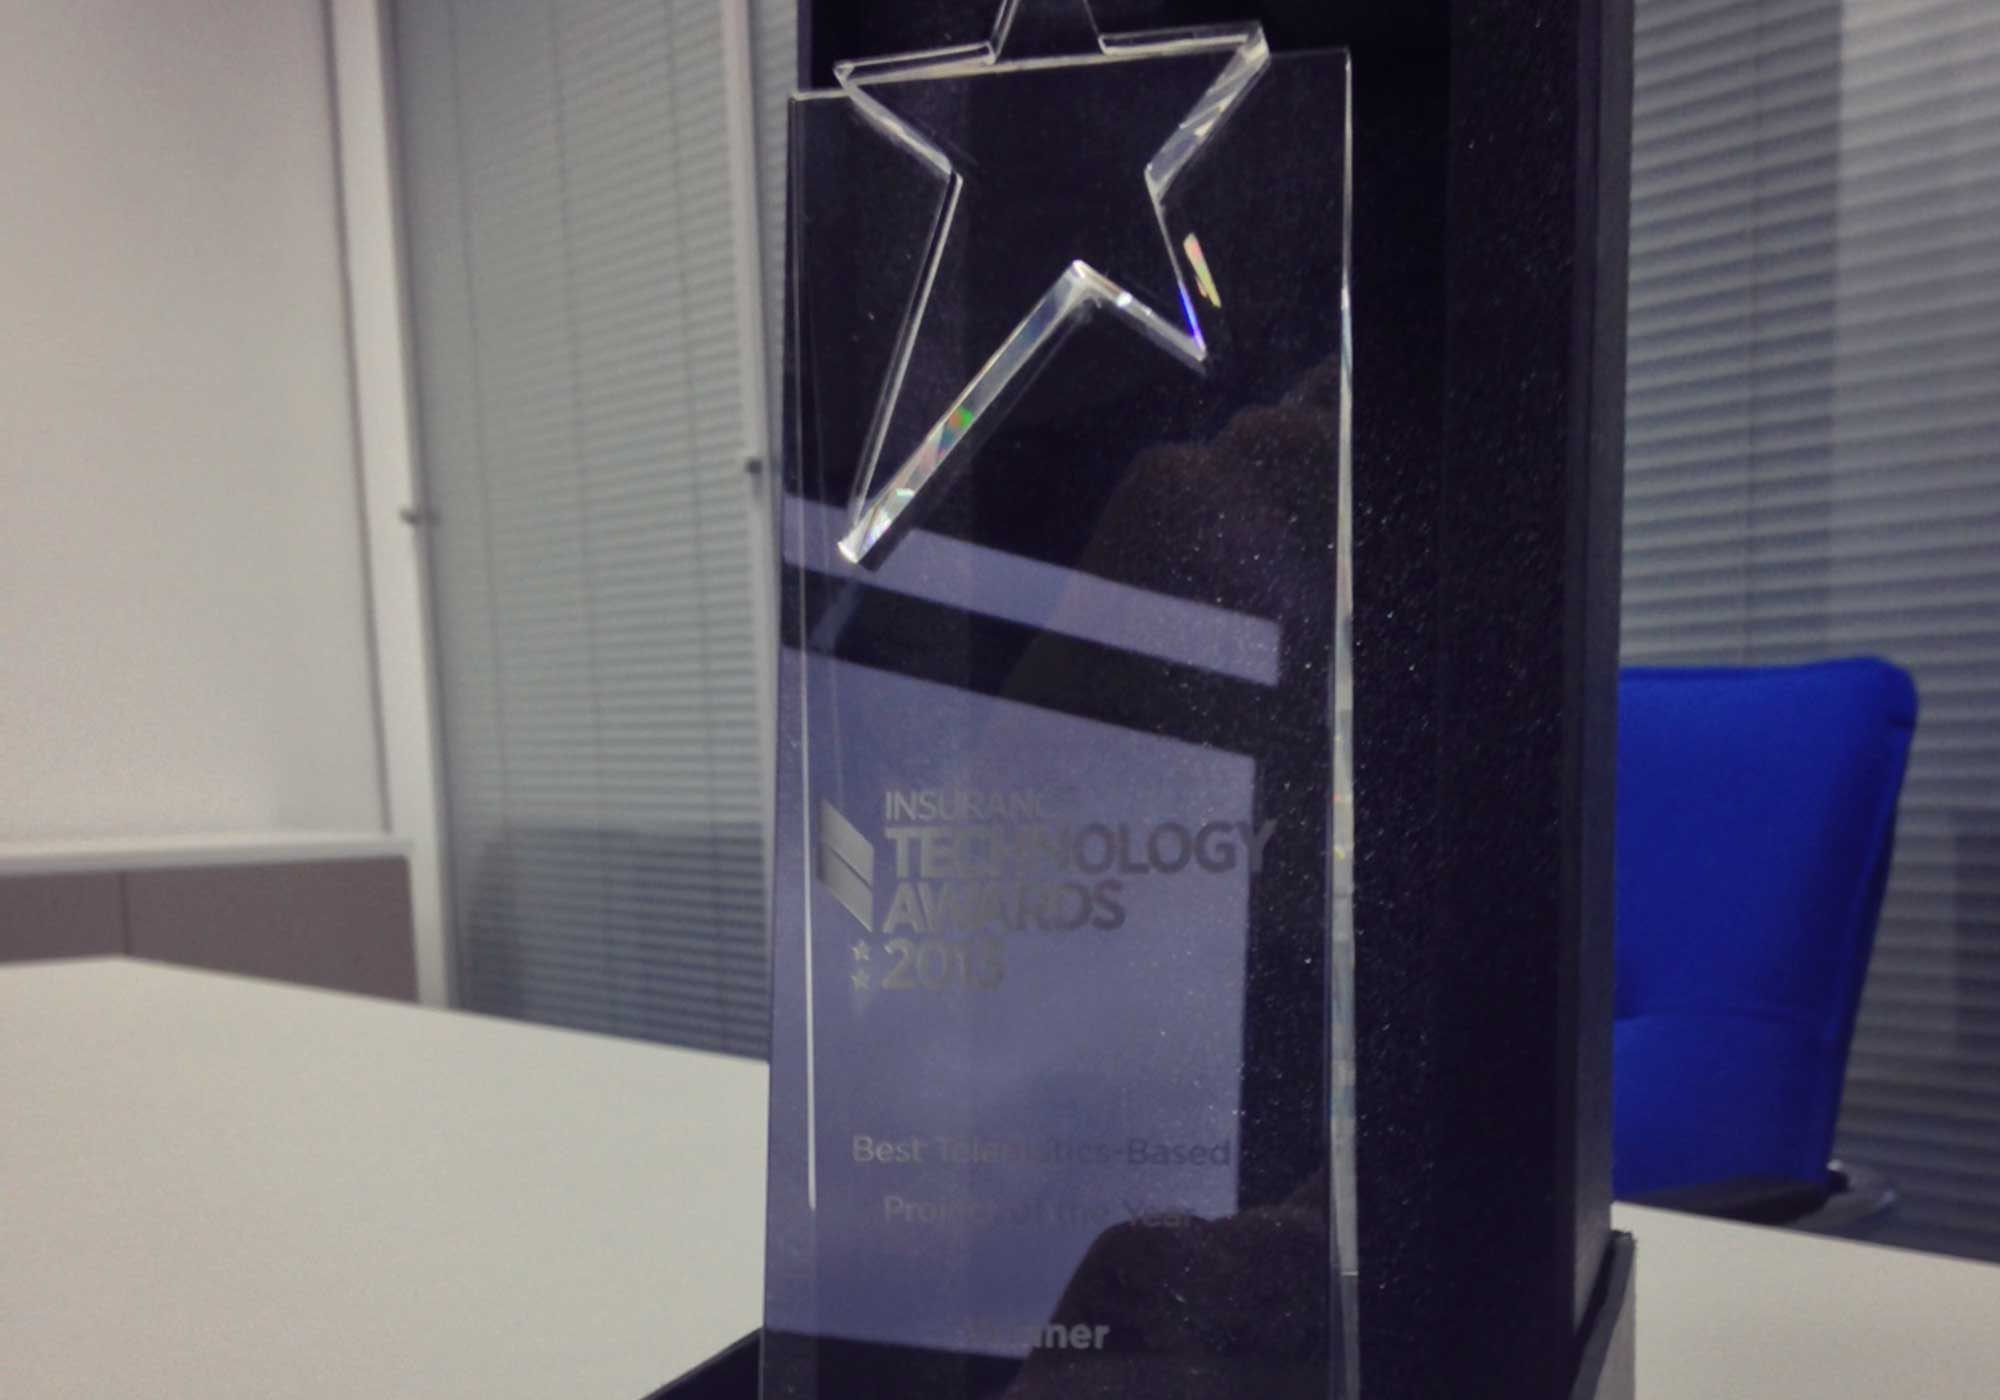 Best telematics awards